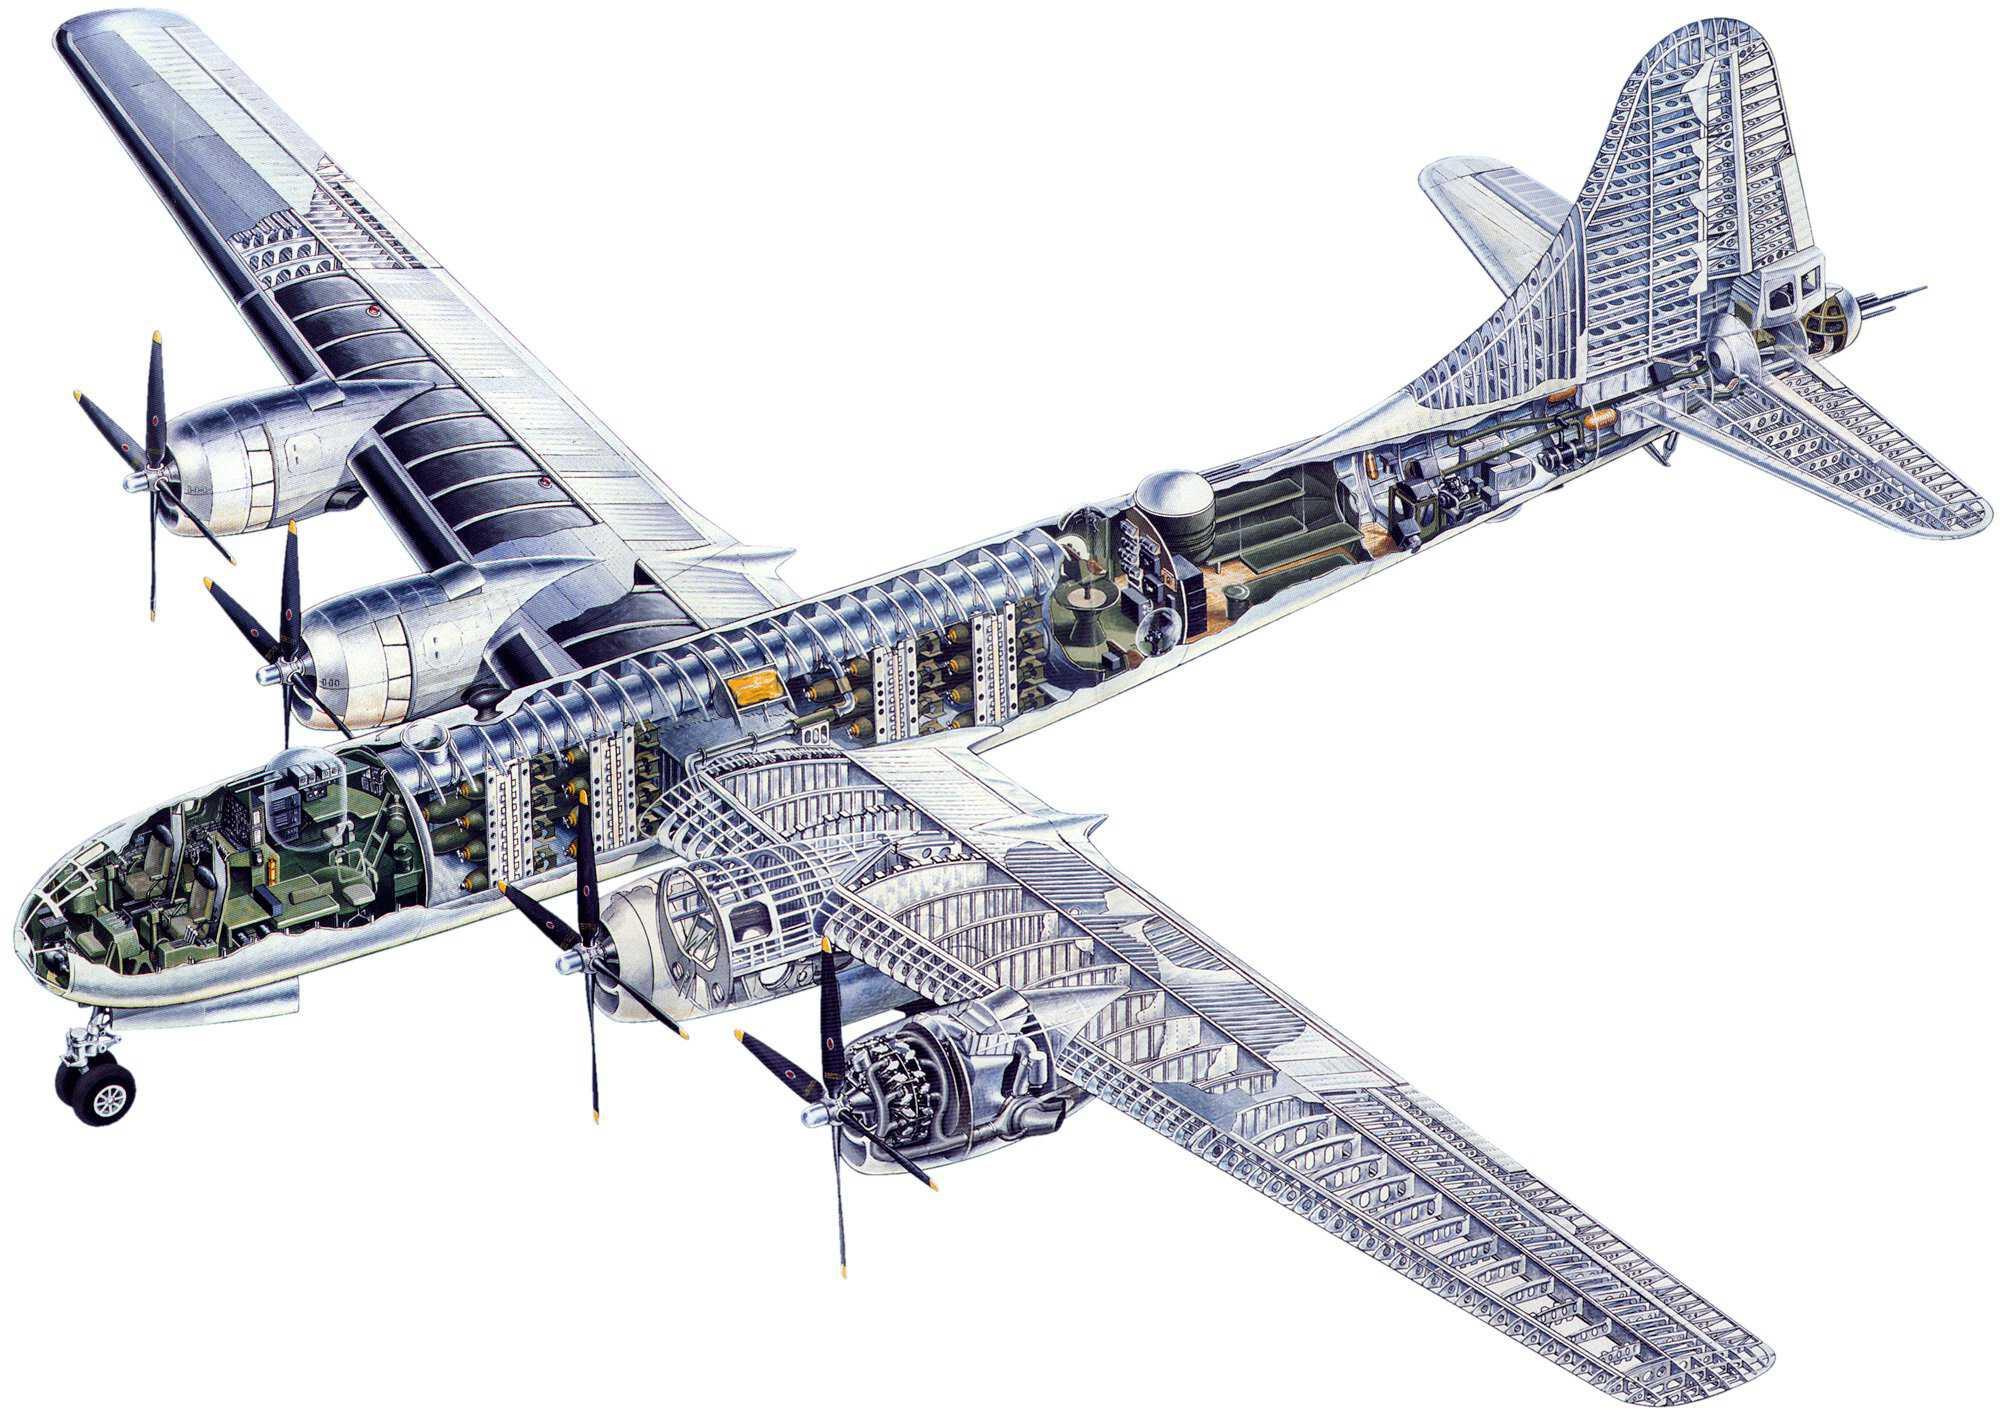 flygirls-1-b29(flat).jpg